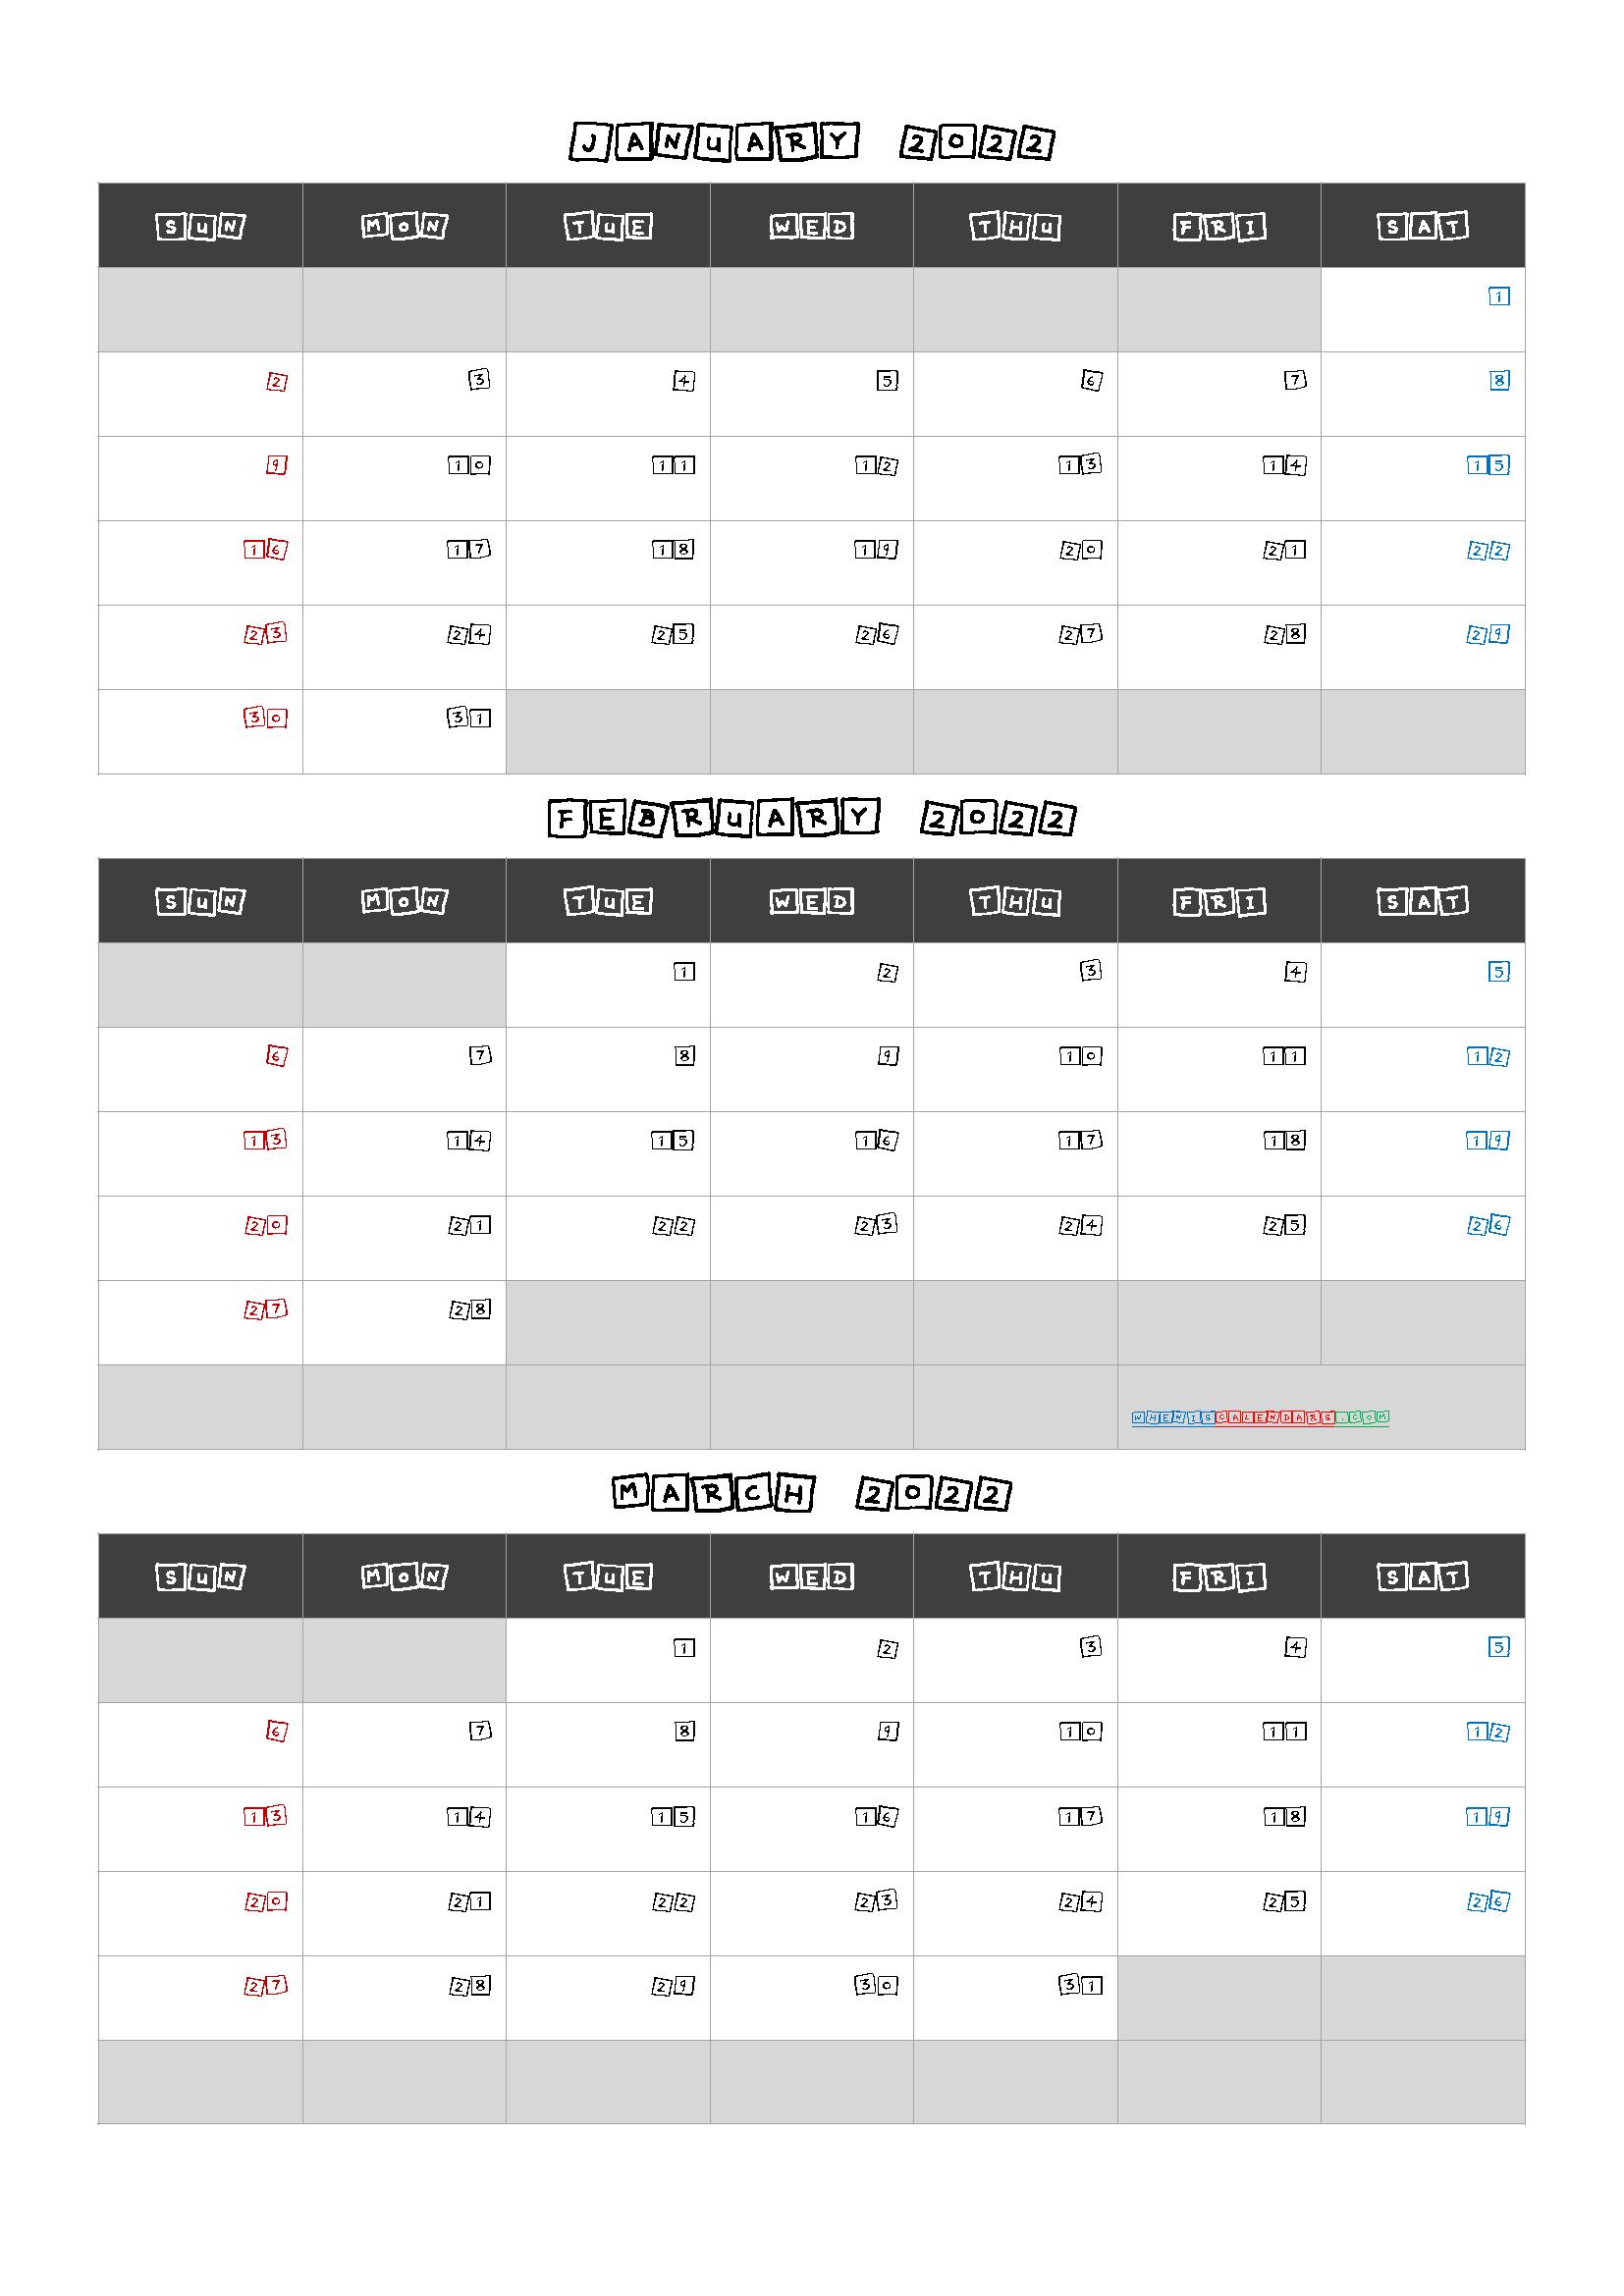 Free January February March 2022 Calendar [Q1 Q2 Q3 Q4] In Throughout January February March April May Calendar